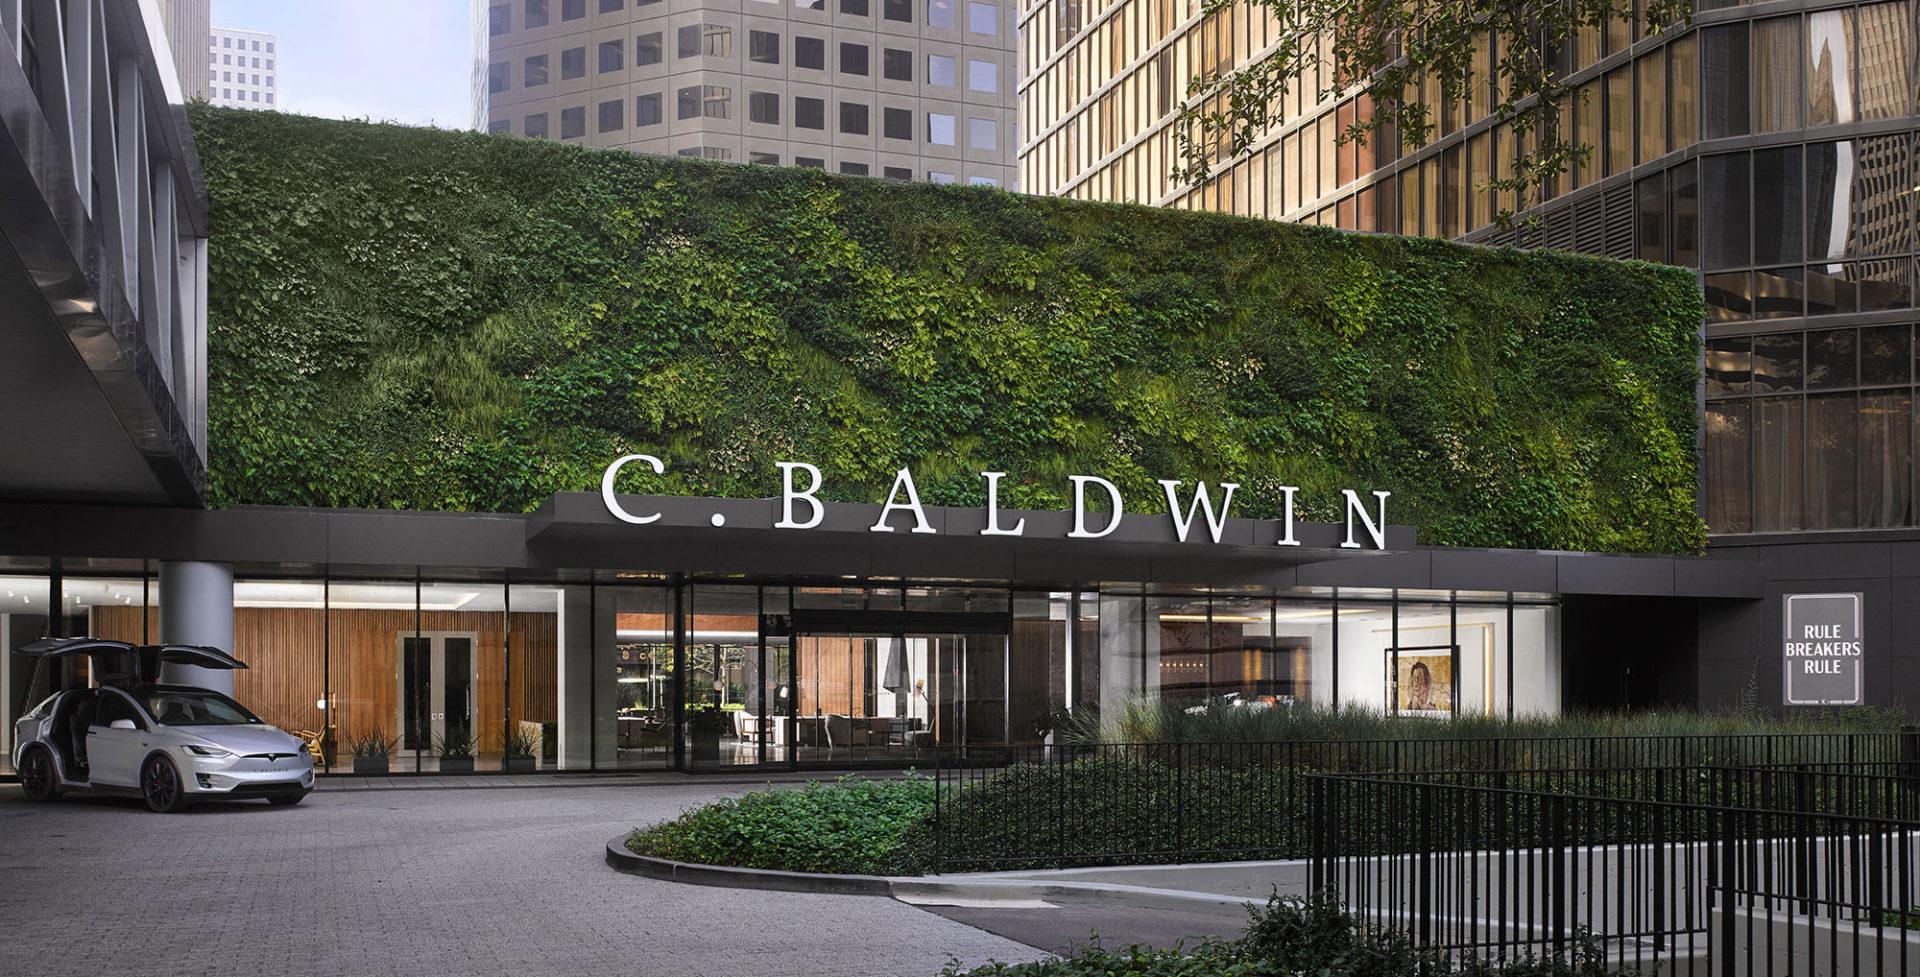 C. Baldwin Hotel – Curio Collection by Hilton